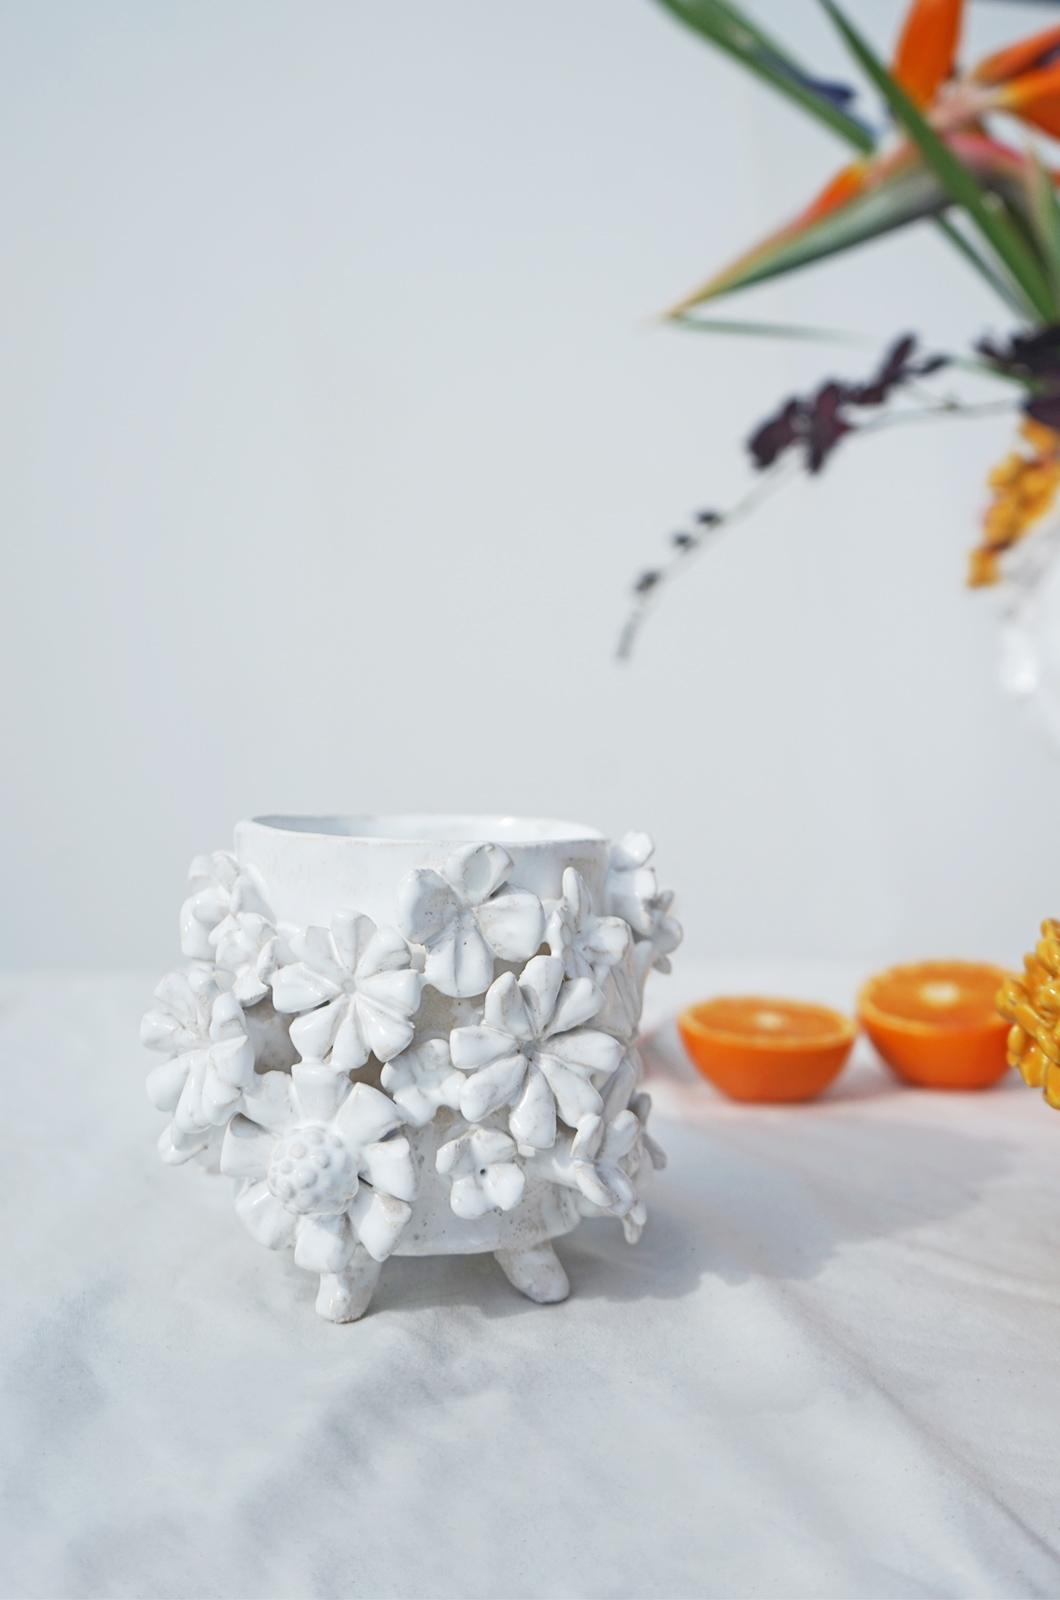 alagonda-bloemen-vaas-wit2